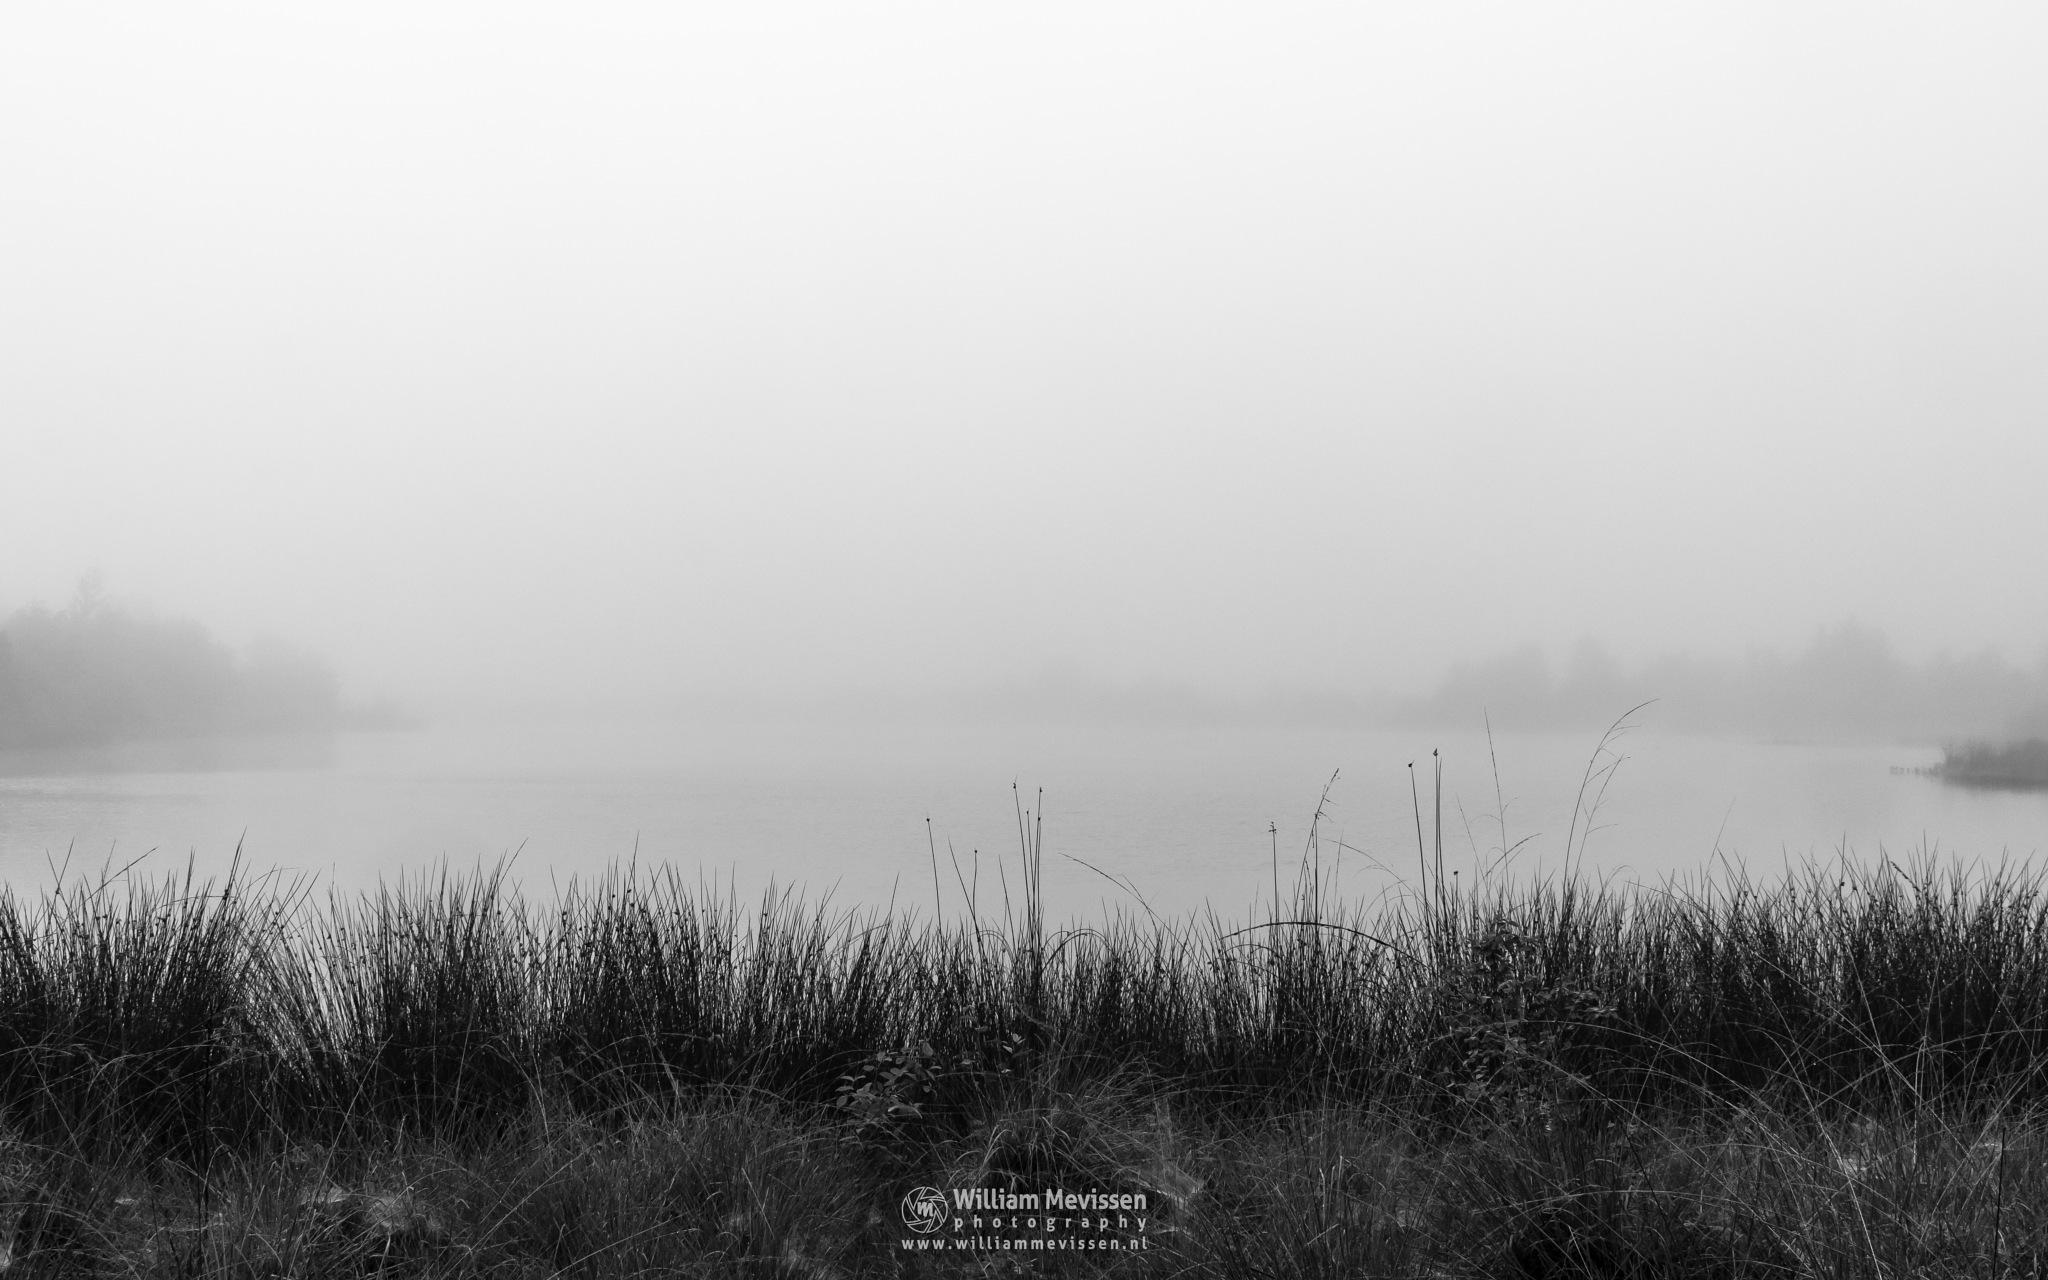 Foggy Westmeerven by William Mevissen